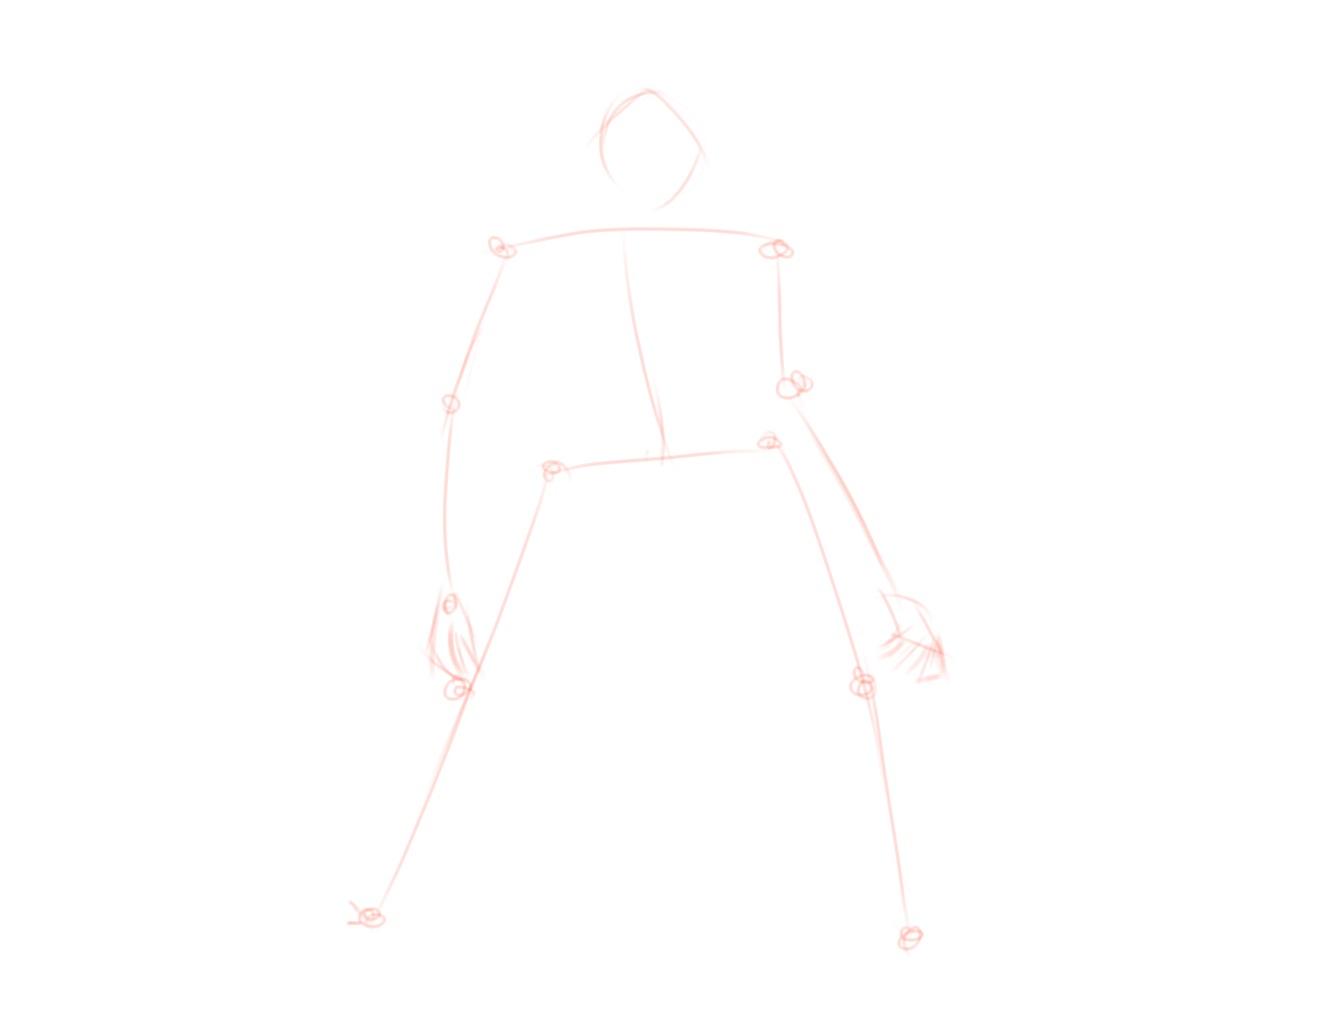 sketches_SE90_1.jpg?1535072121